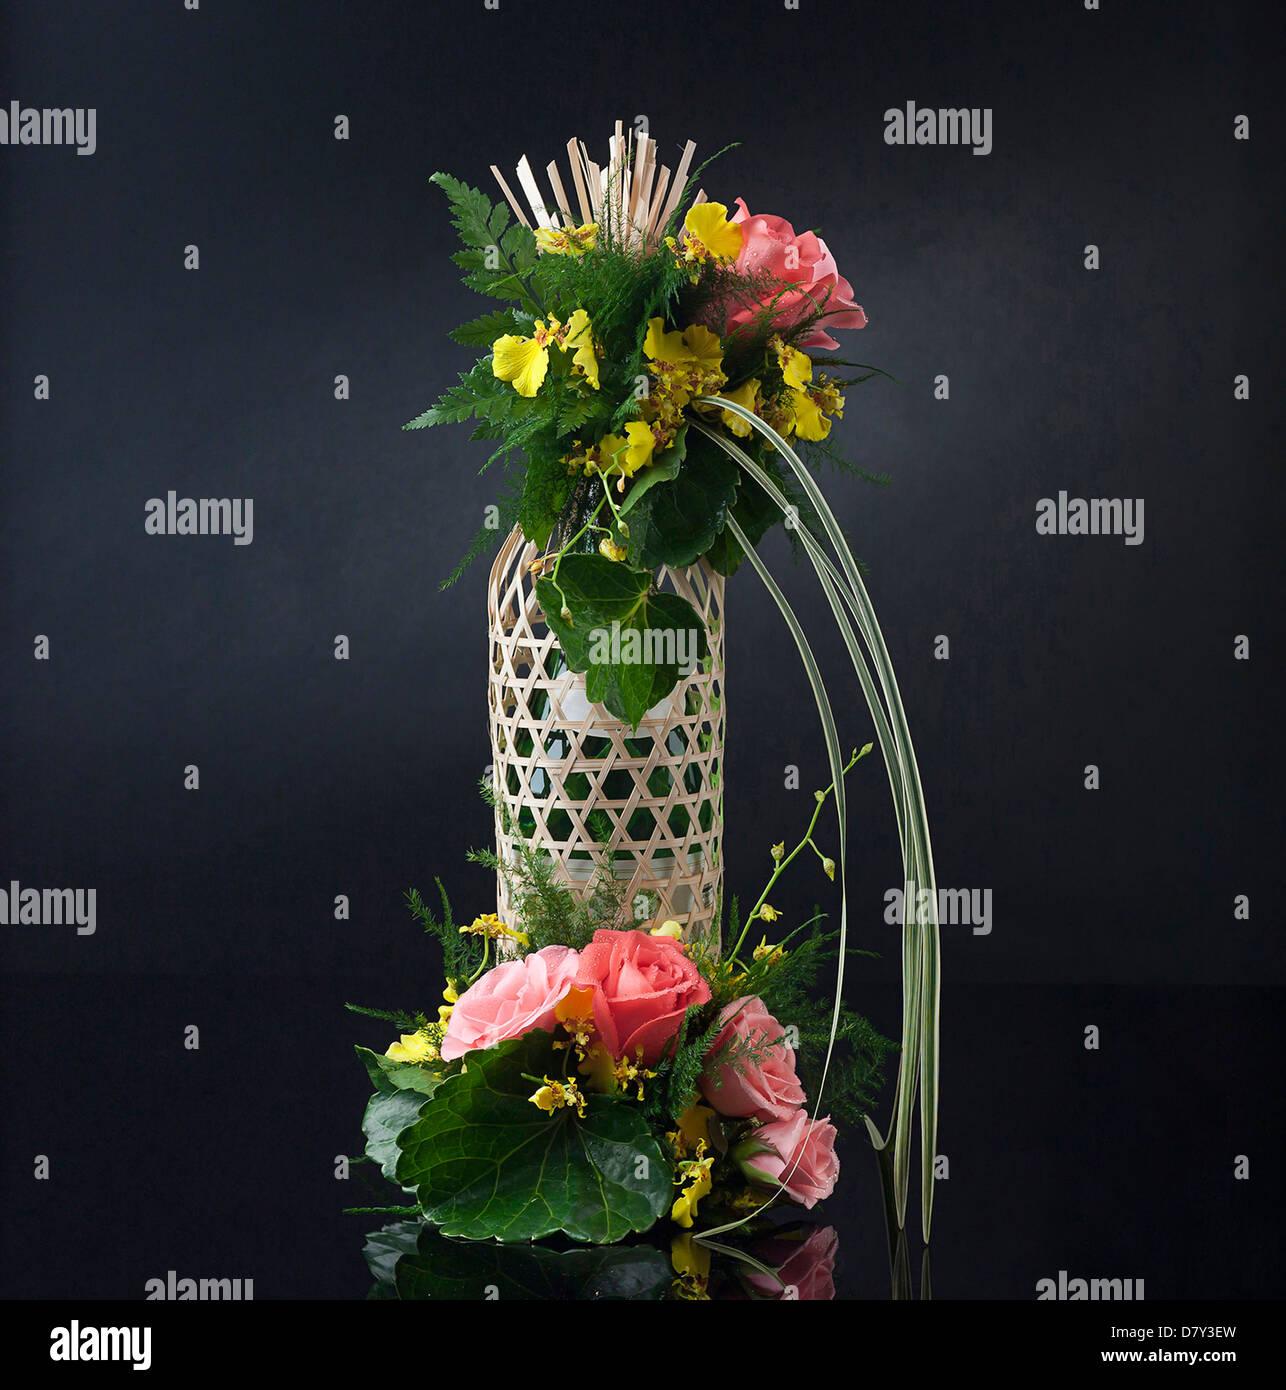 bamboo floral arrangement stockfotos bamboo floral. Black Bedroom Furniture Sets. Home Design Ideas